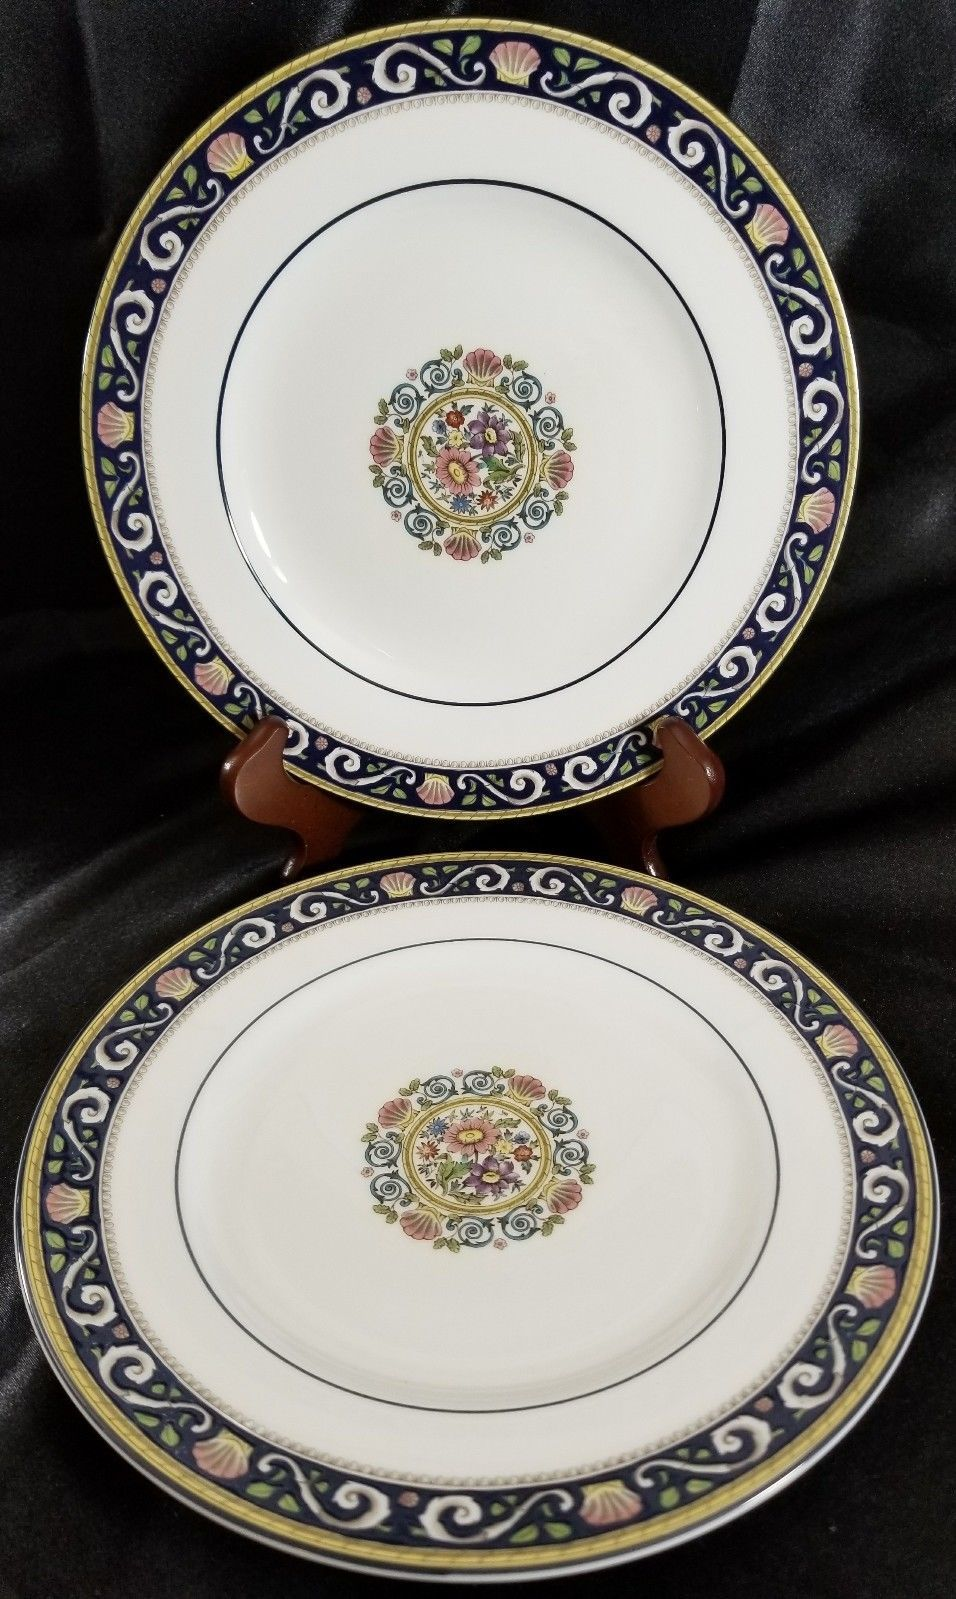 "Wedgwood Runnymede Blue Salad Plates 8.25"" (2)"